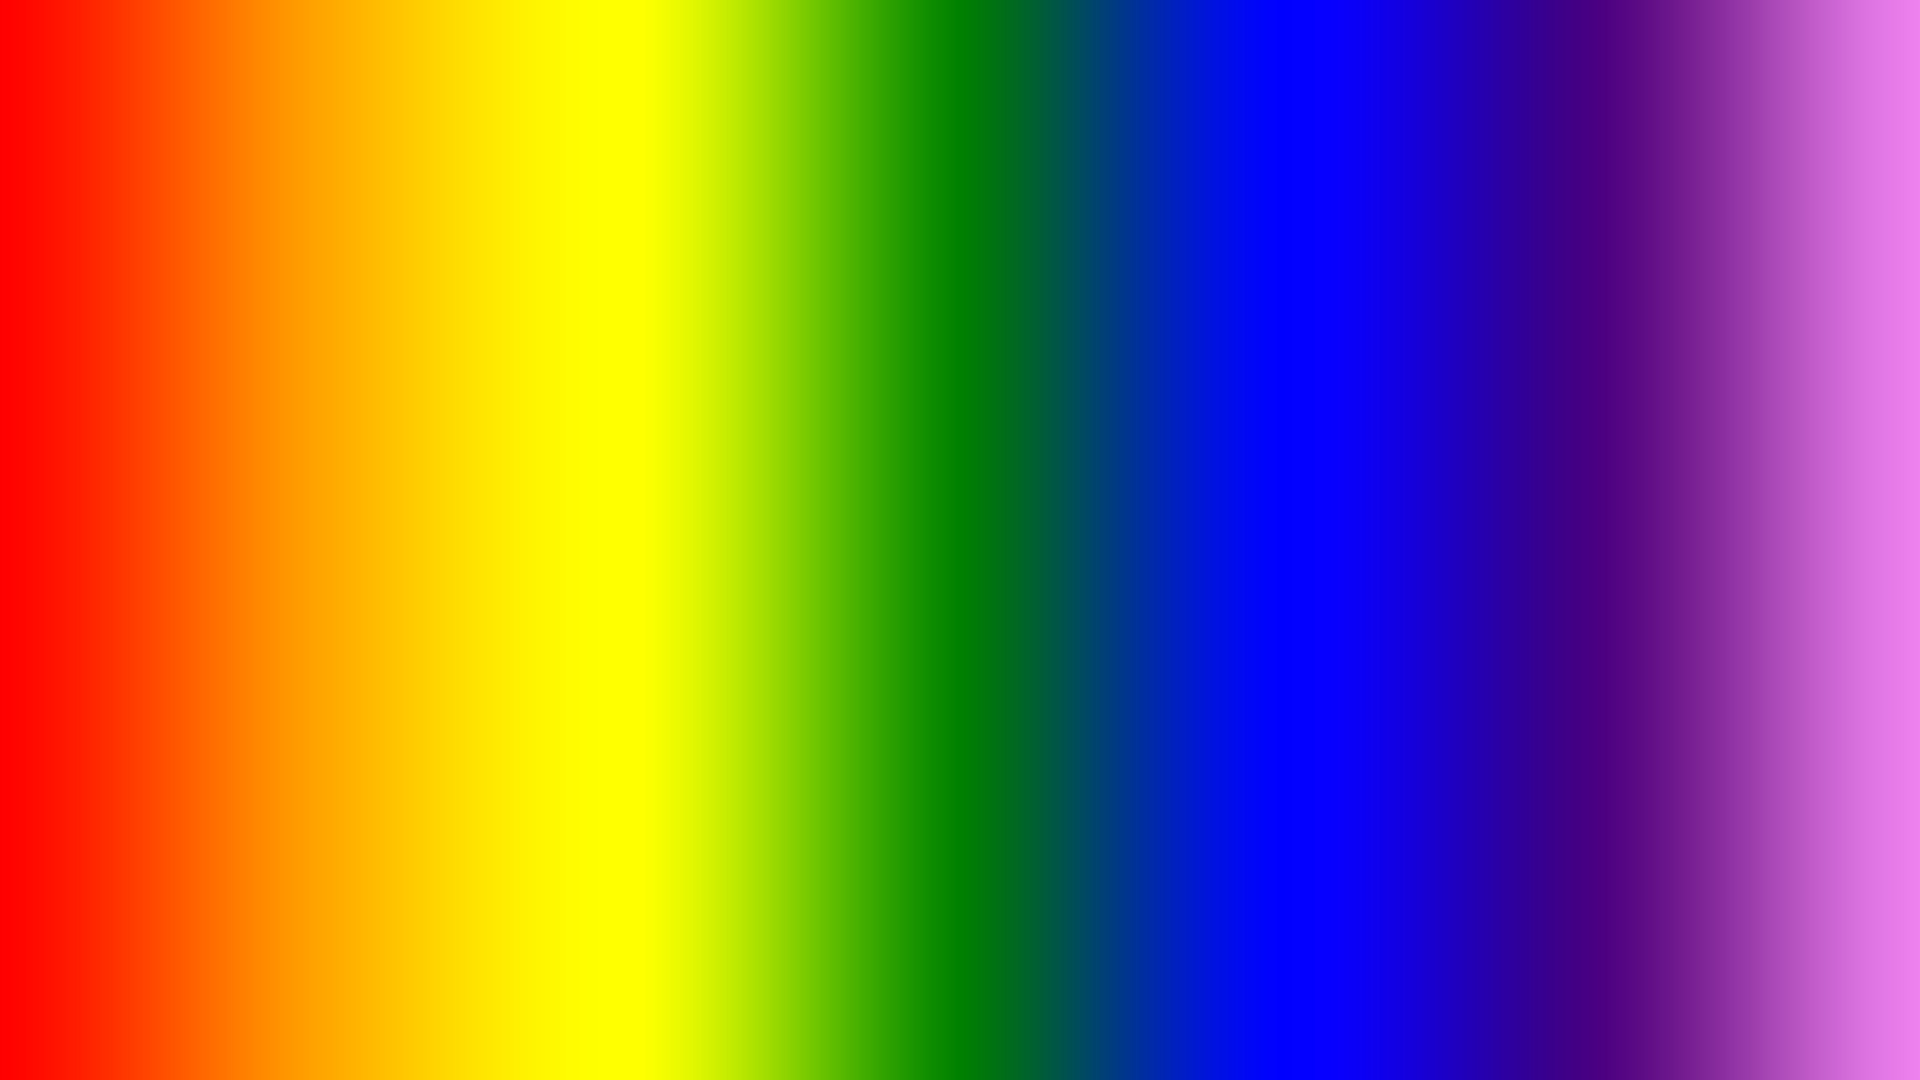 Color Gradient Image Generator Script (Free Download)